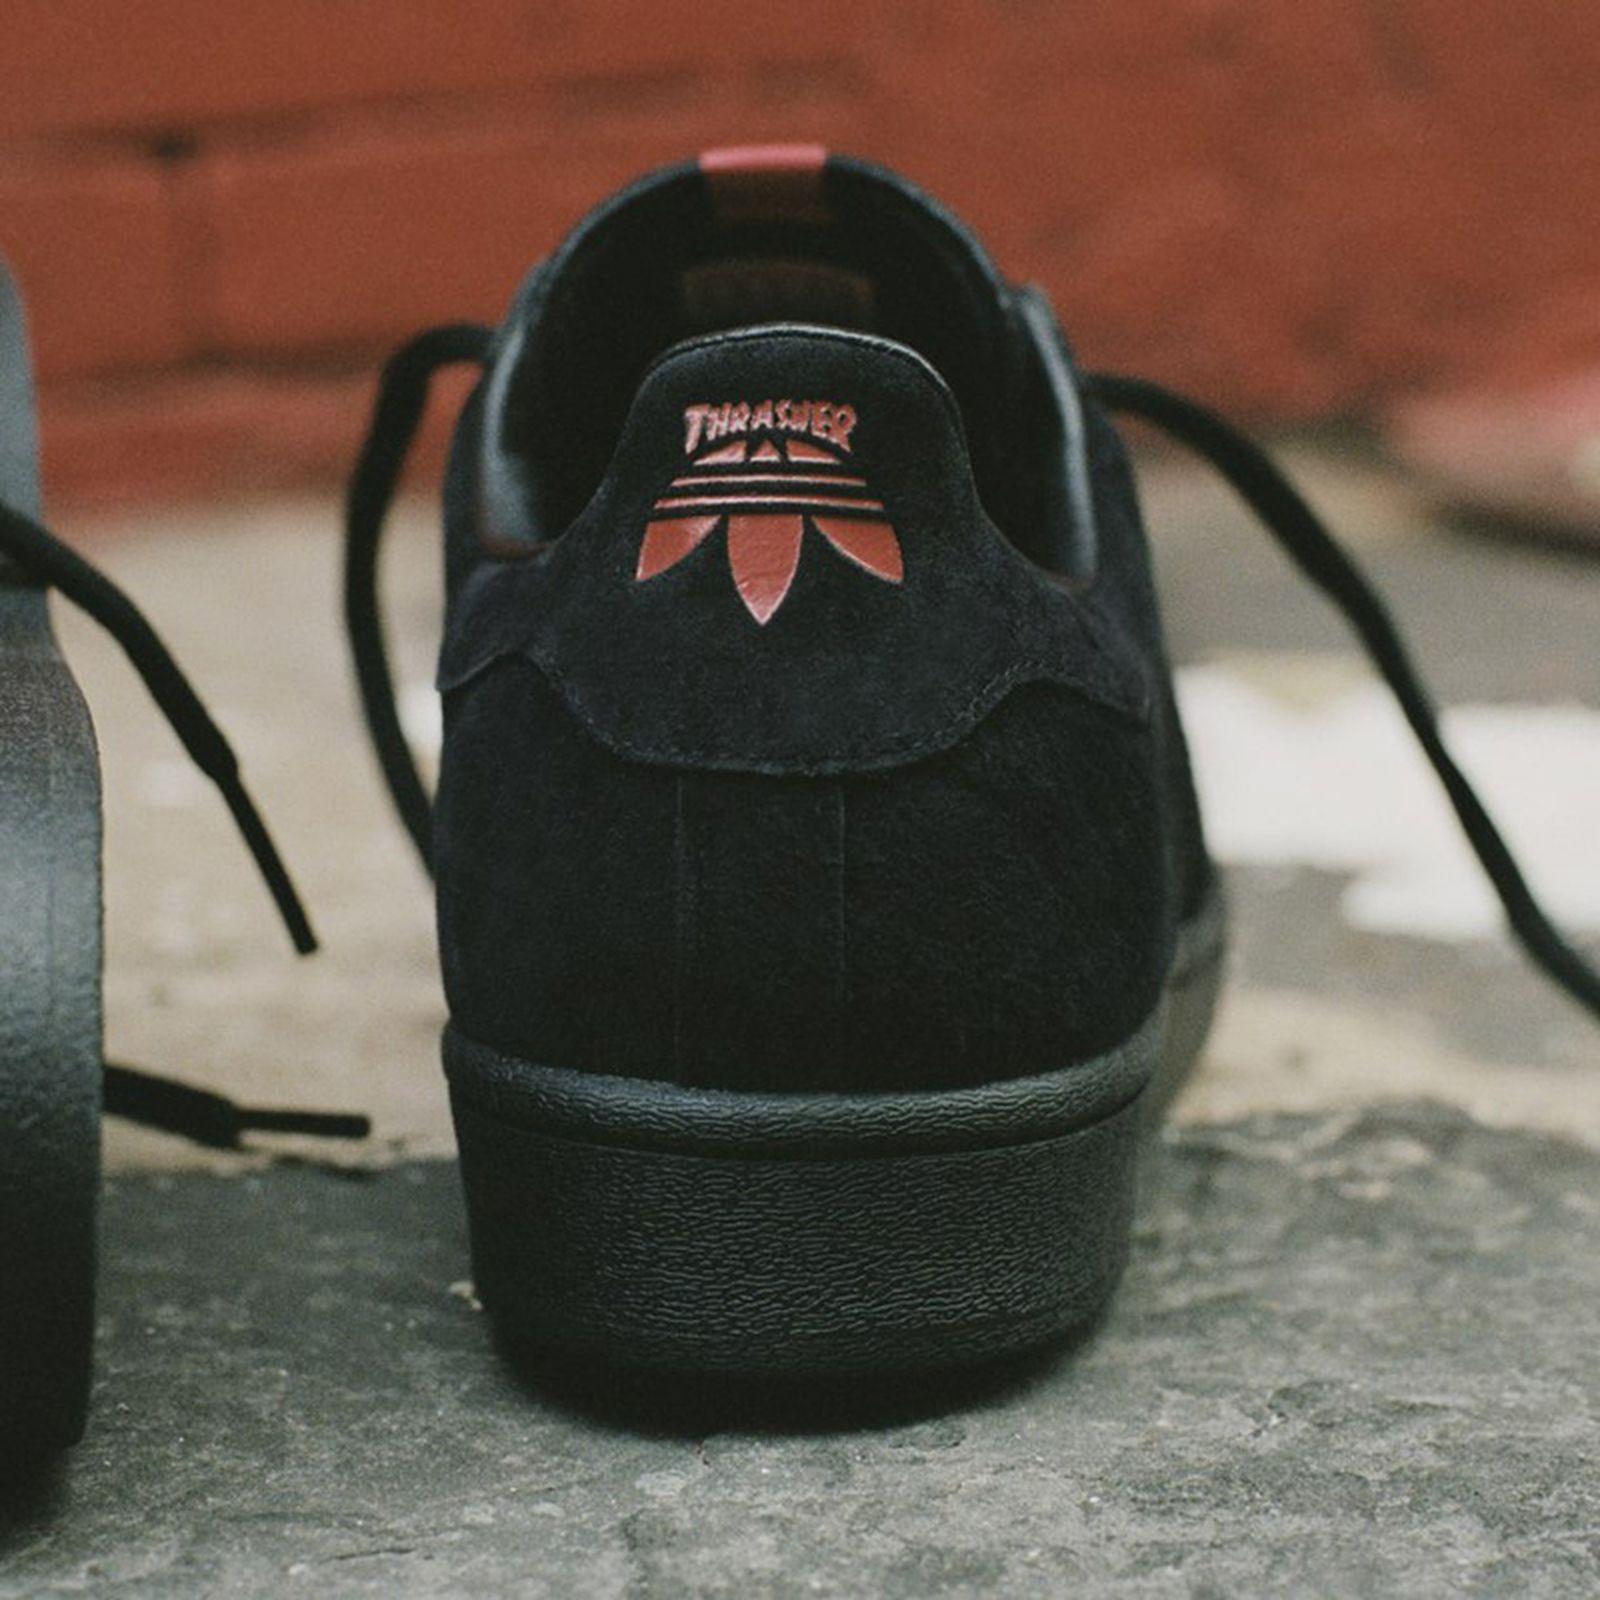 thrasher-adidas-superstar-adv-tyshawn-jones-release-date-price-03